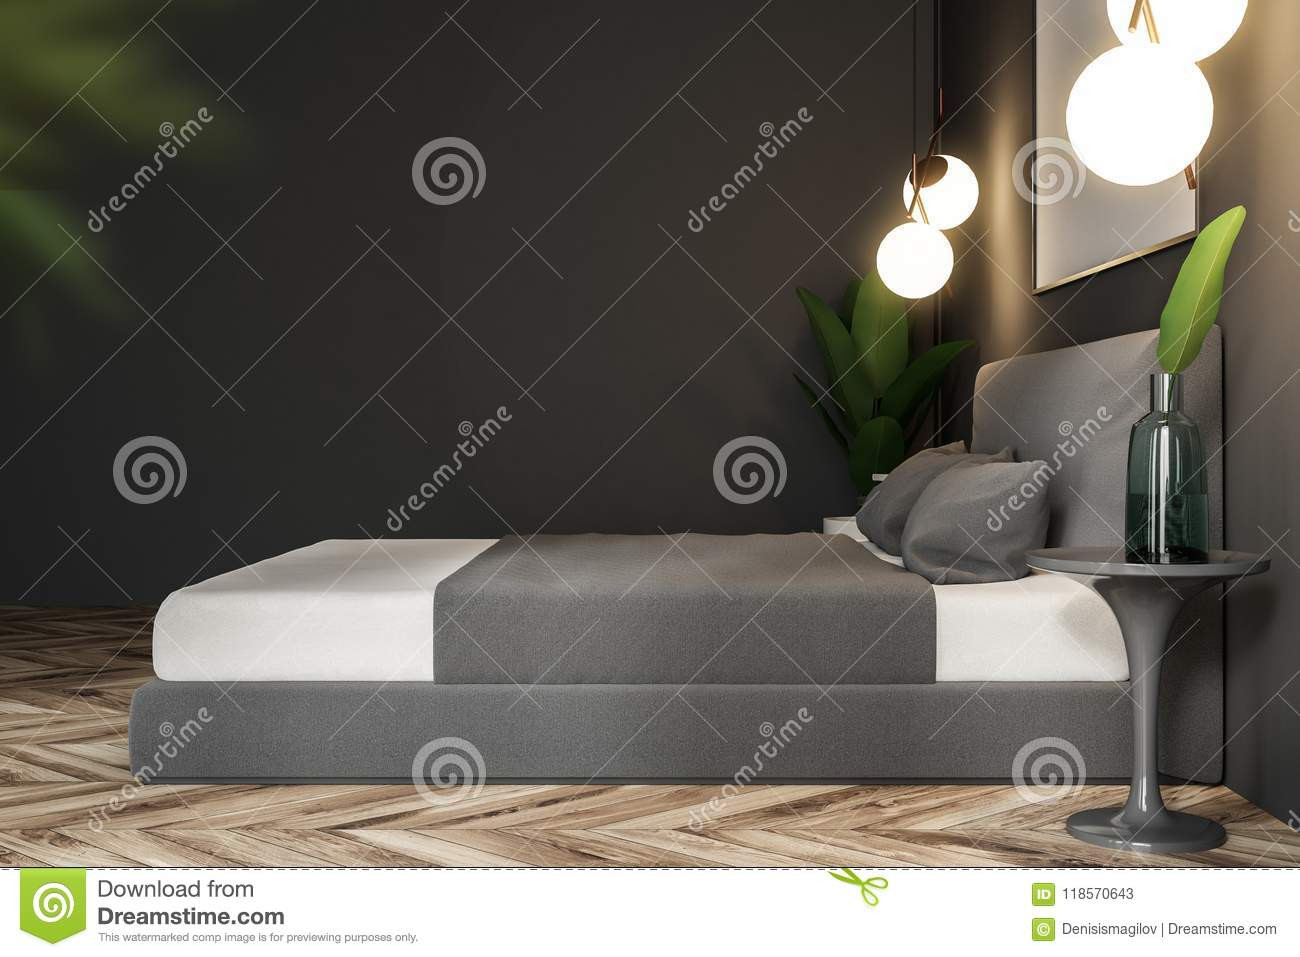 grey hardwood floors in bedroom of gray nature style bedroom side view stock illustration throughout gray nature style bedroom side view